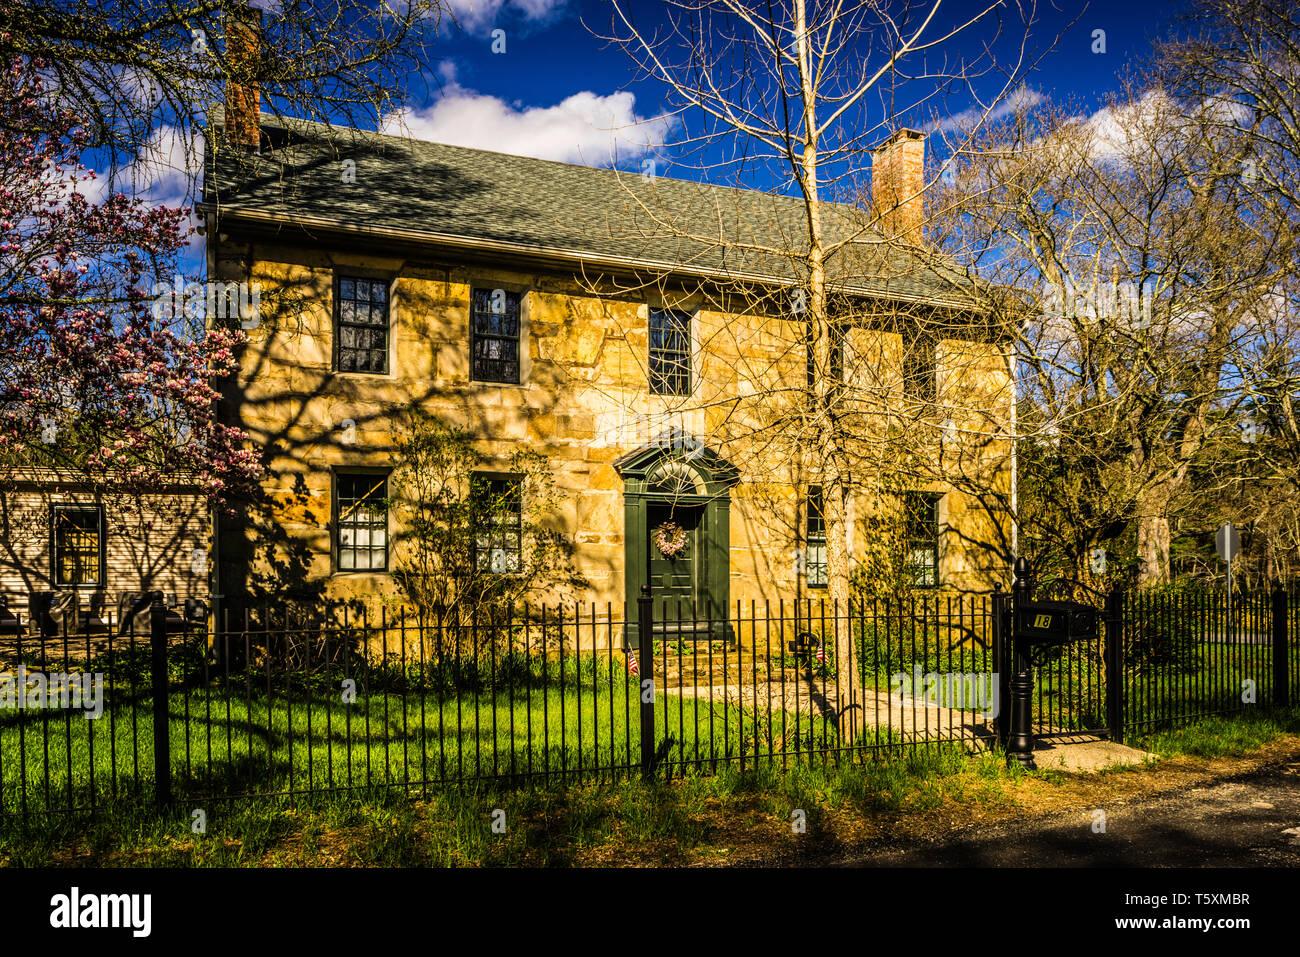 Daniel's Village Archeological Site _ Killingly, Connecticut, USA - Stock Image